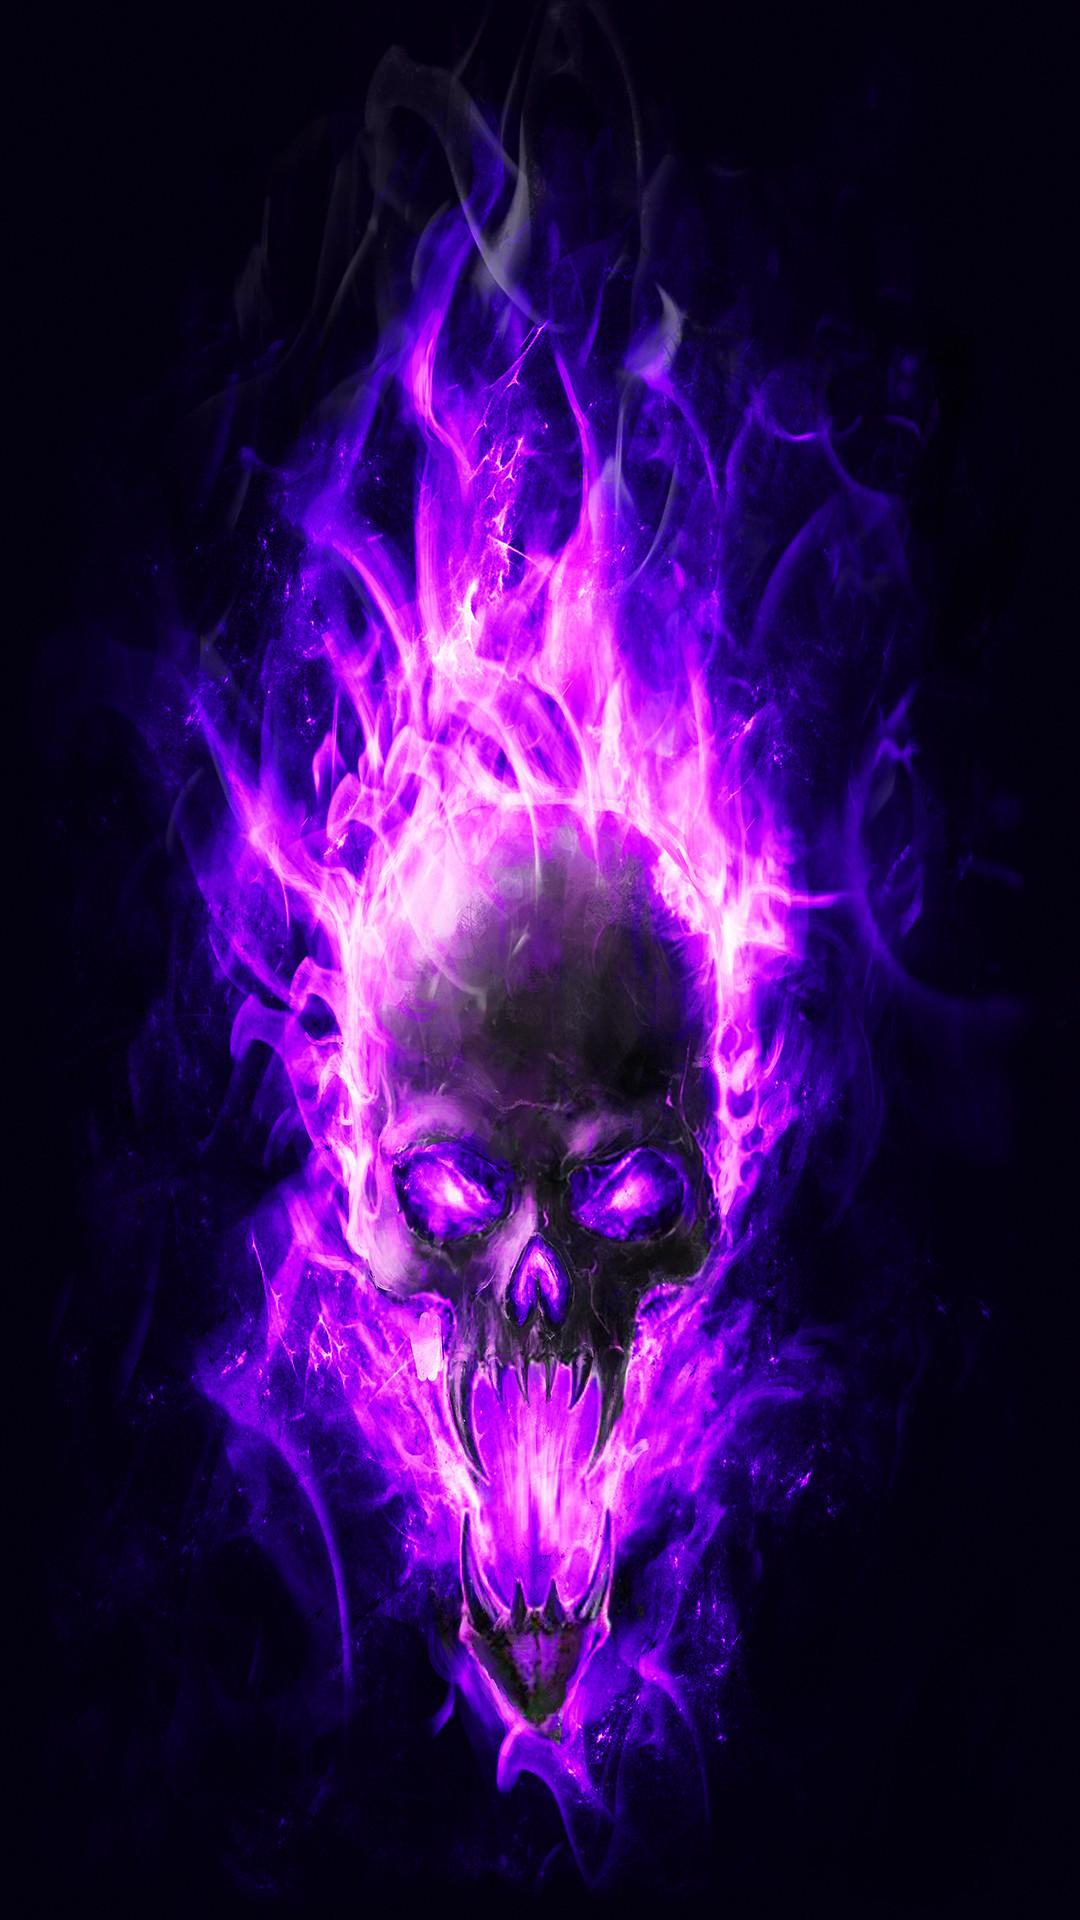 Free Download 55 Flaming Skulls Wallpapers On Wallpaperplay